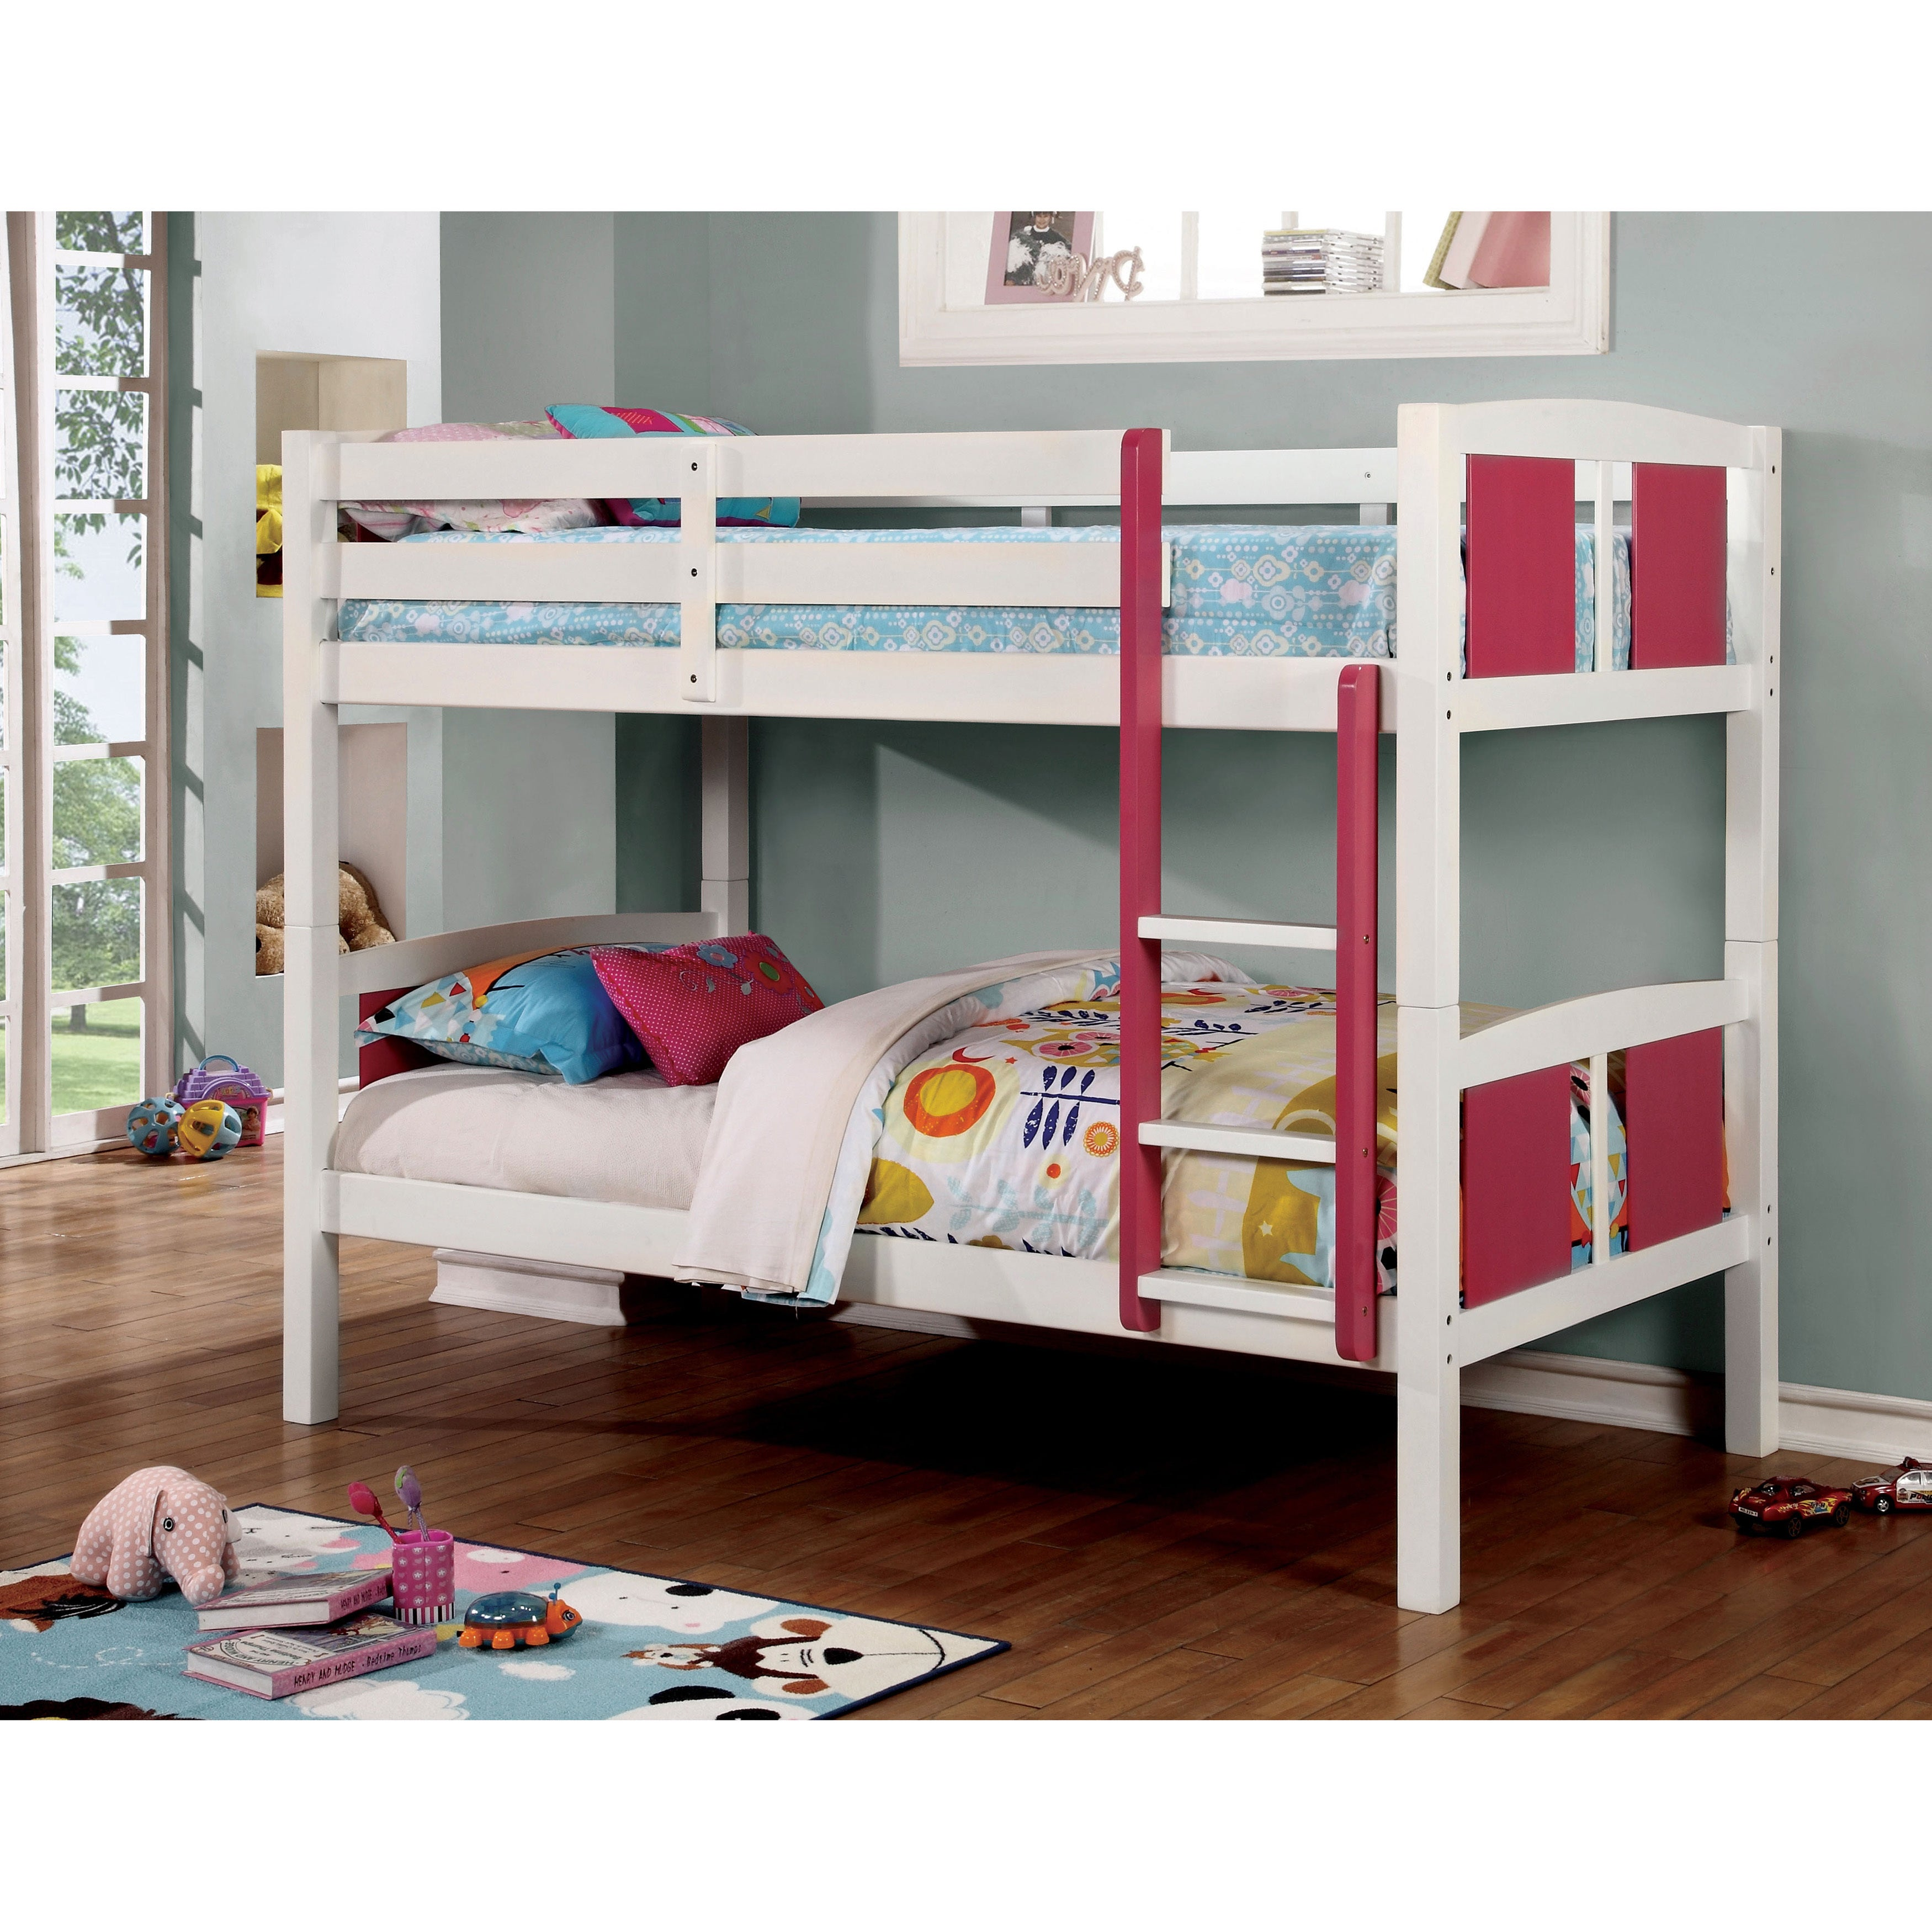 Furniture of America Piers III Two-tone Pink/White Bunk B...